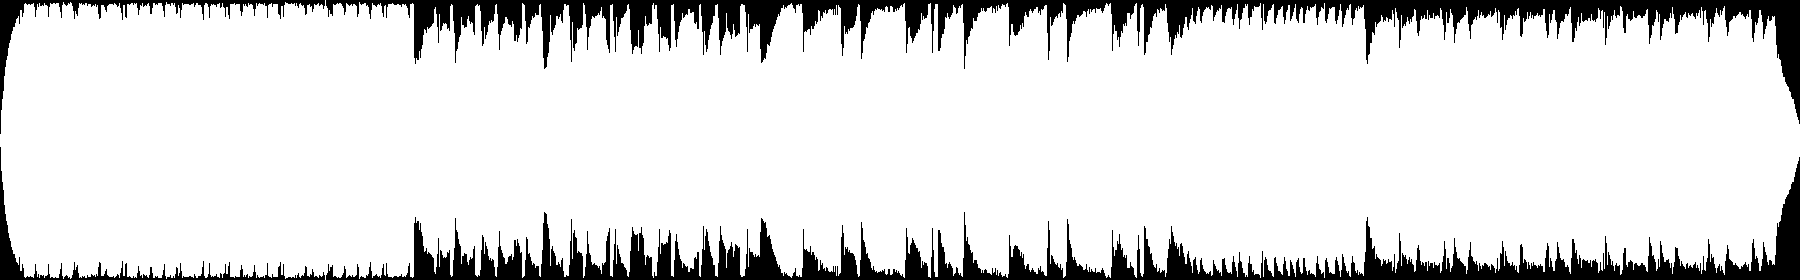 WKND audio waveform